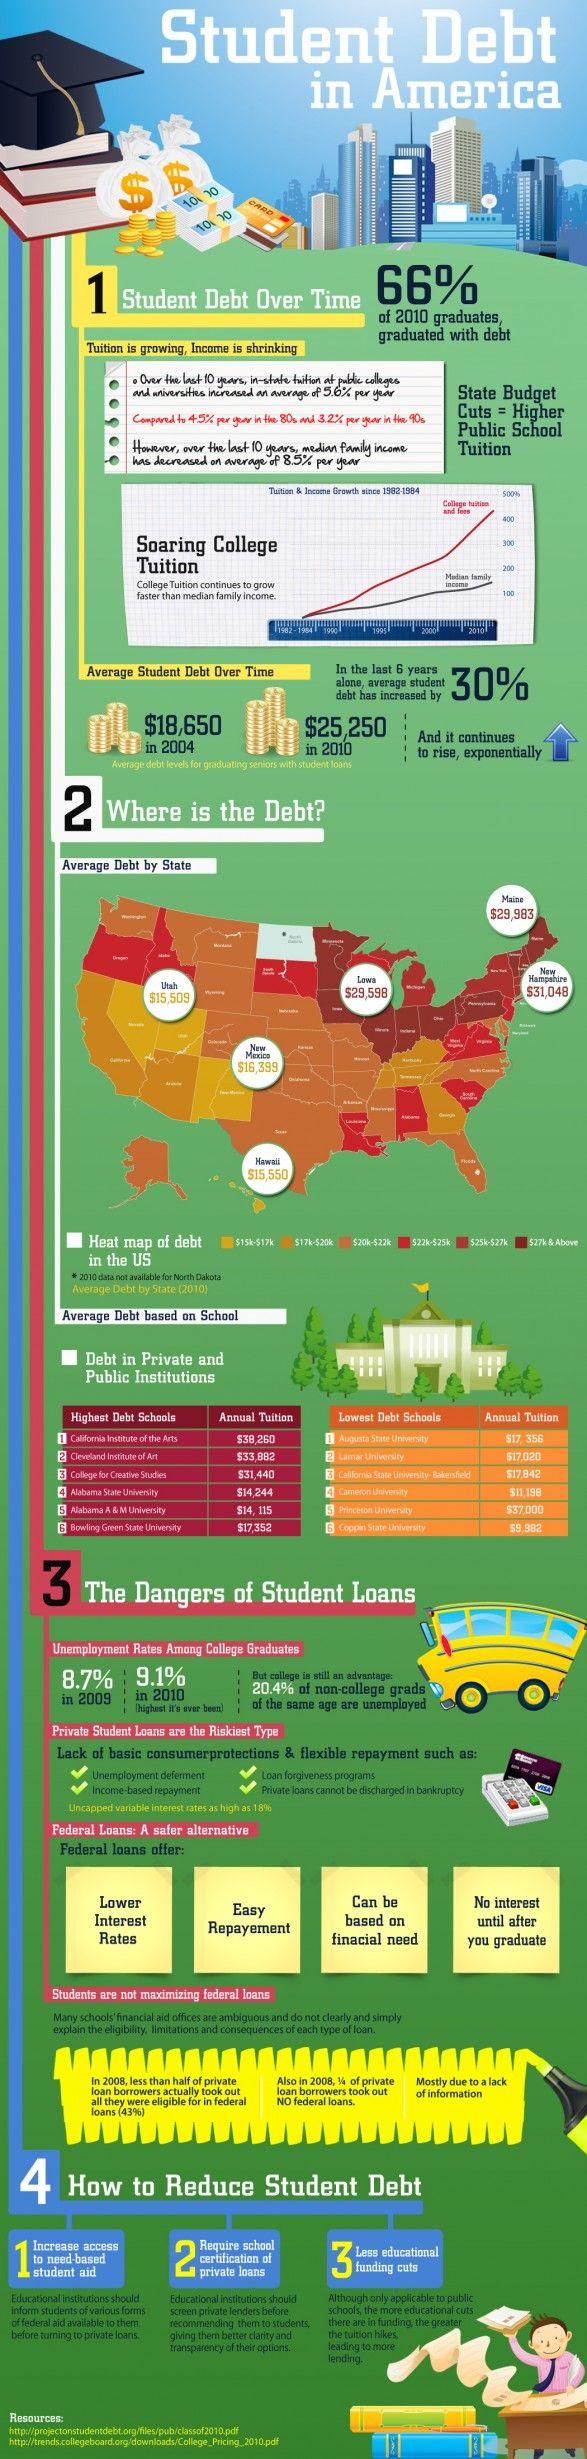 Student Debt in America